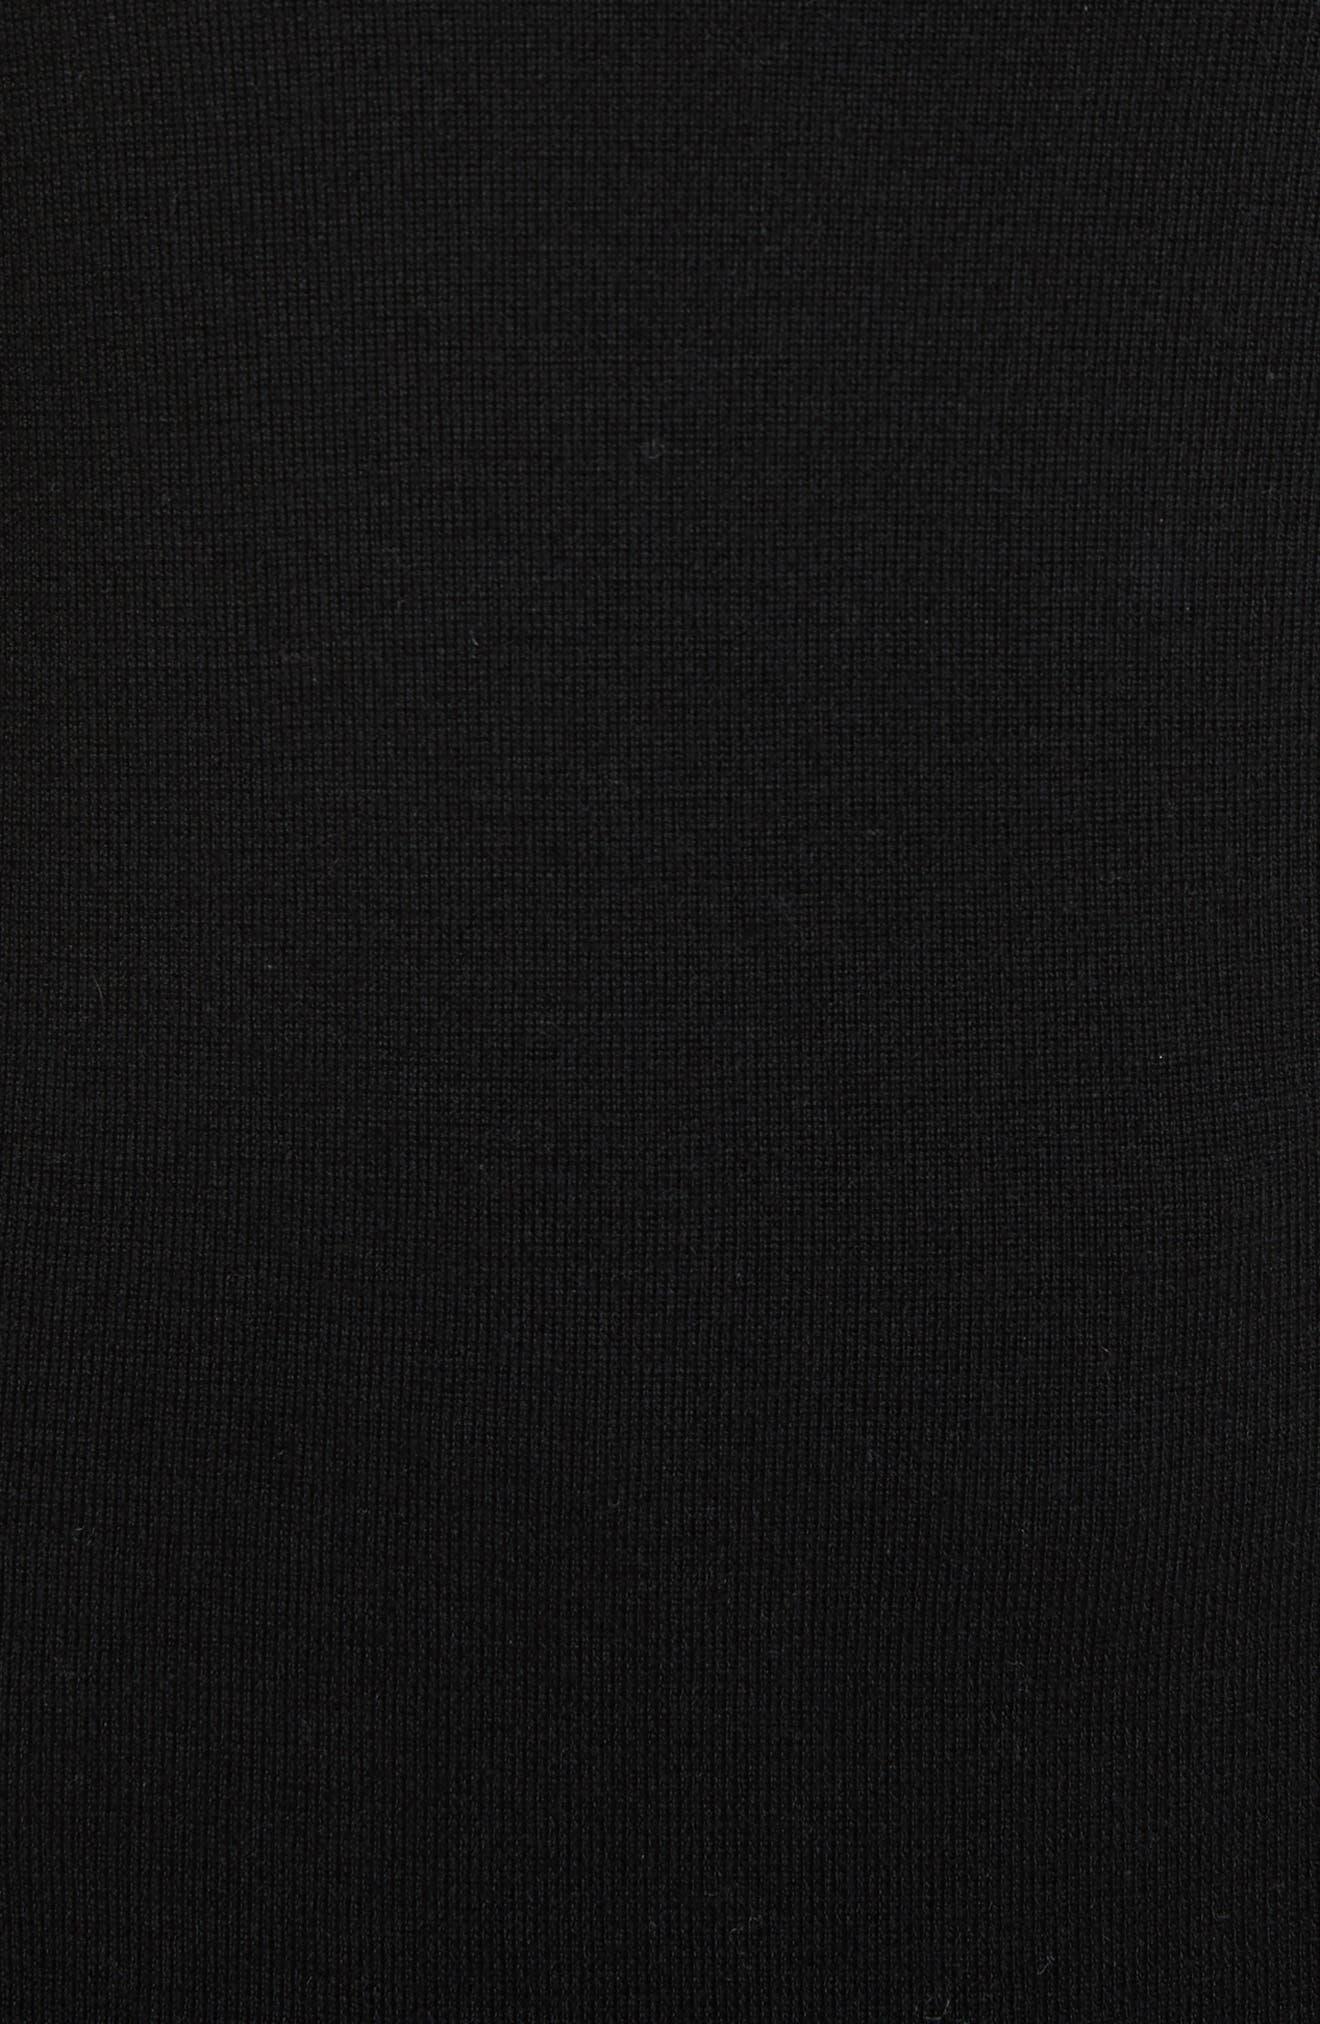 Slit Back Sweater,                             Alternate thumbnail 5, color,                             Black